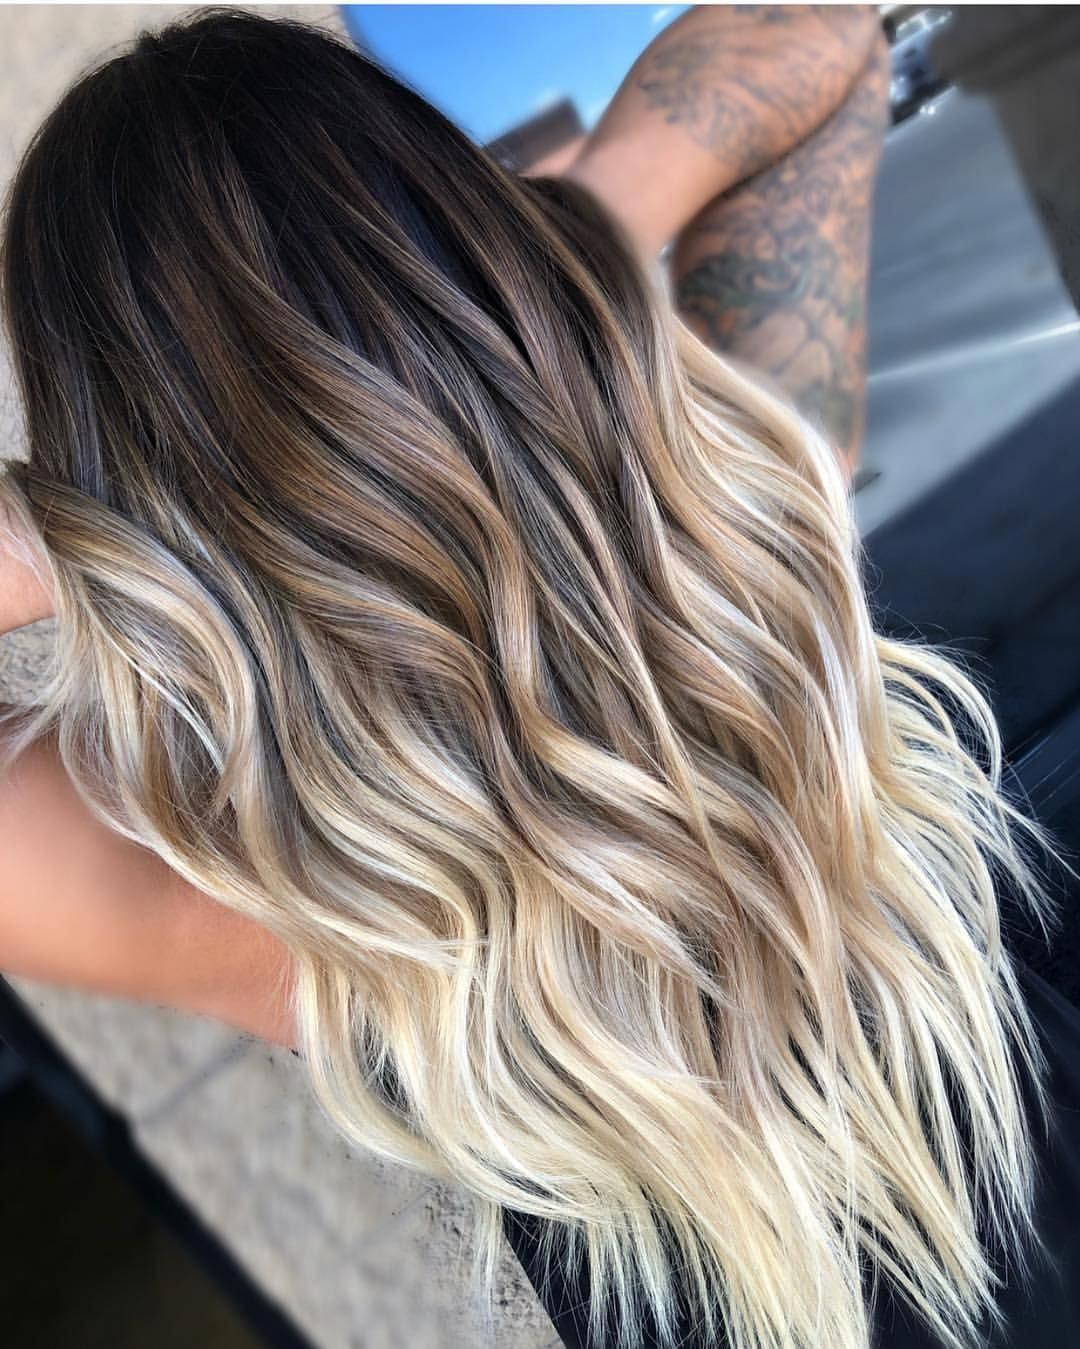 "MODERN SALON on Instagram: ""Stunning extension and color work by @balayagedbyhaley and @goddessofbalayage 🙌🙌 well done! • • • #modernsalon #bayalage #blondebalayage…"""